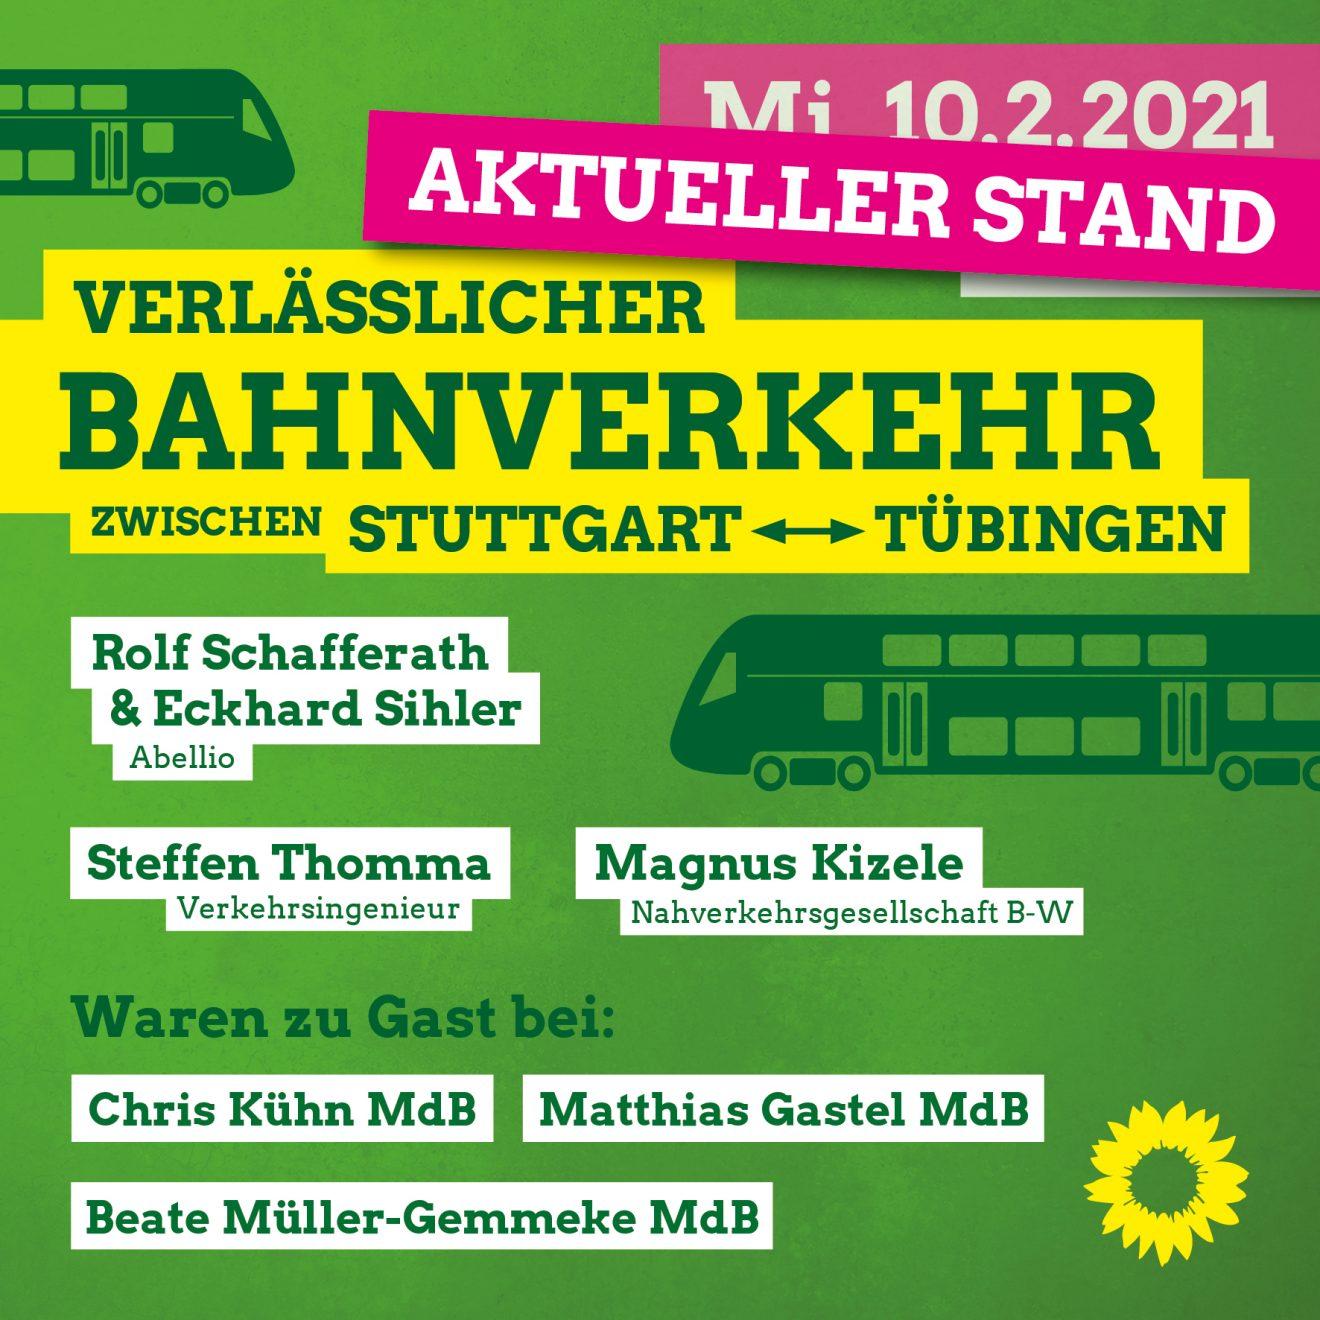 Sharepic TÜ - S Rückblick Veranstaltung